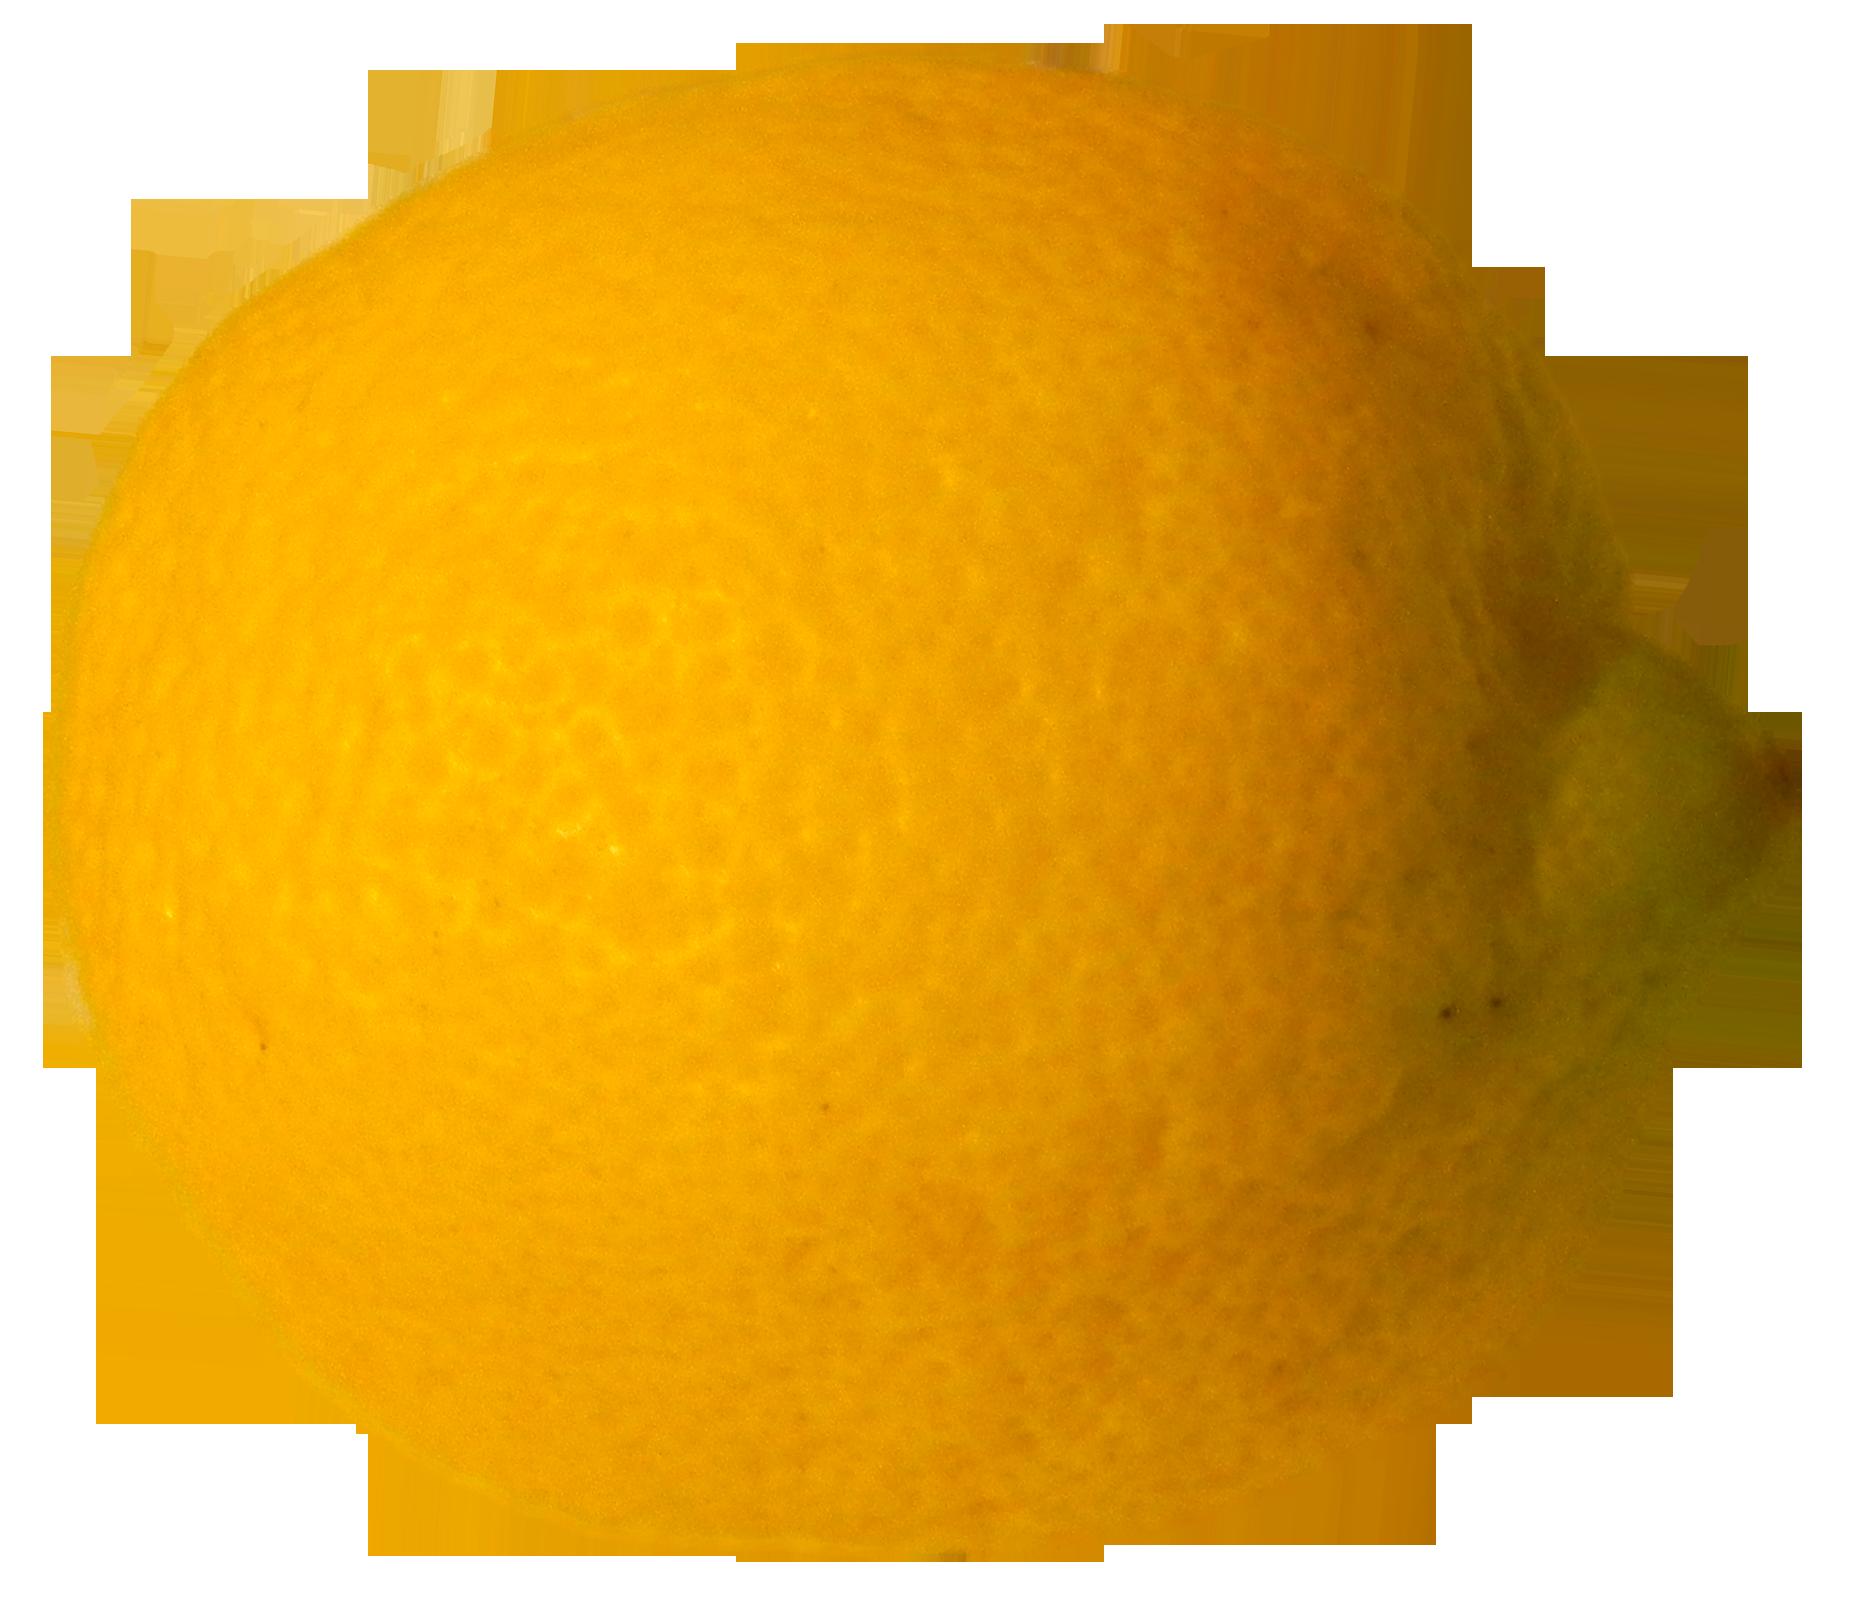 Lemon Png image #38648